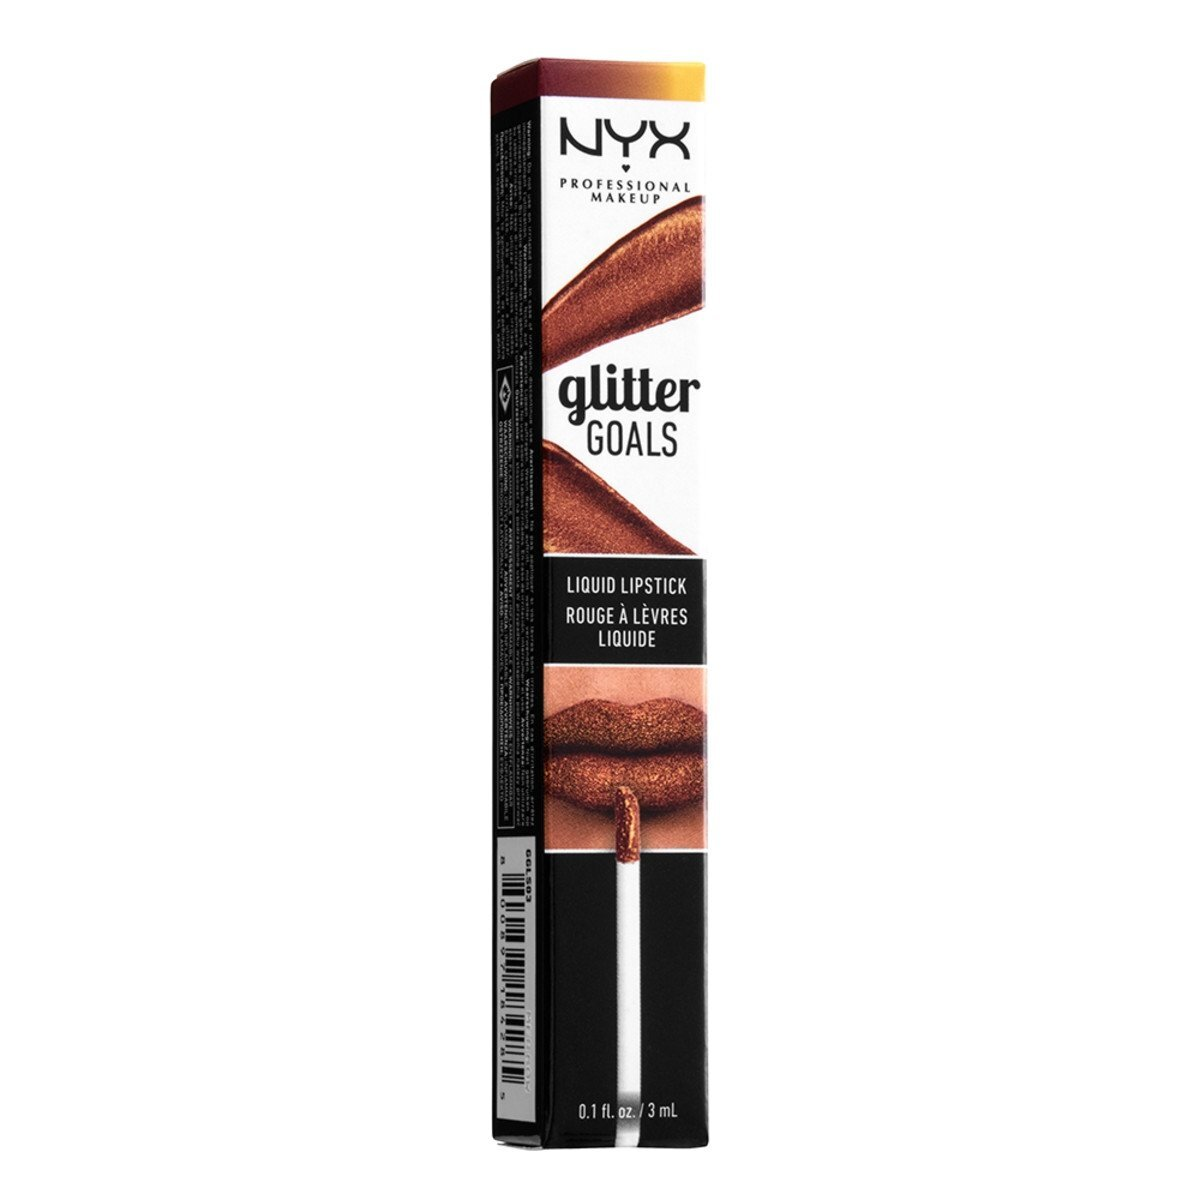 Glitter Goals Liquid Lipstick - Crystal Crush